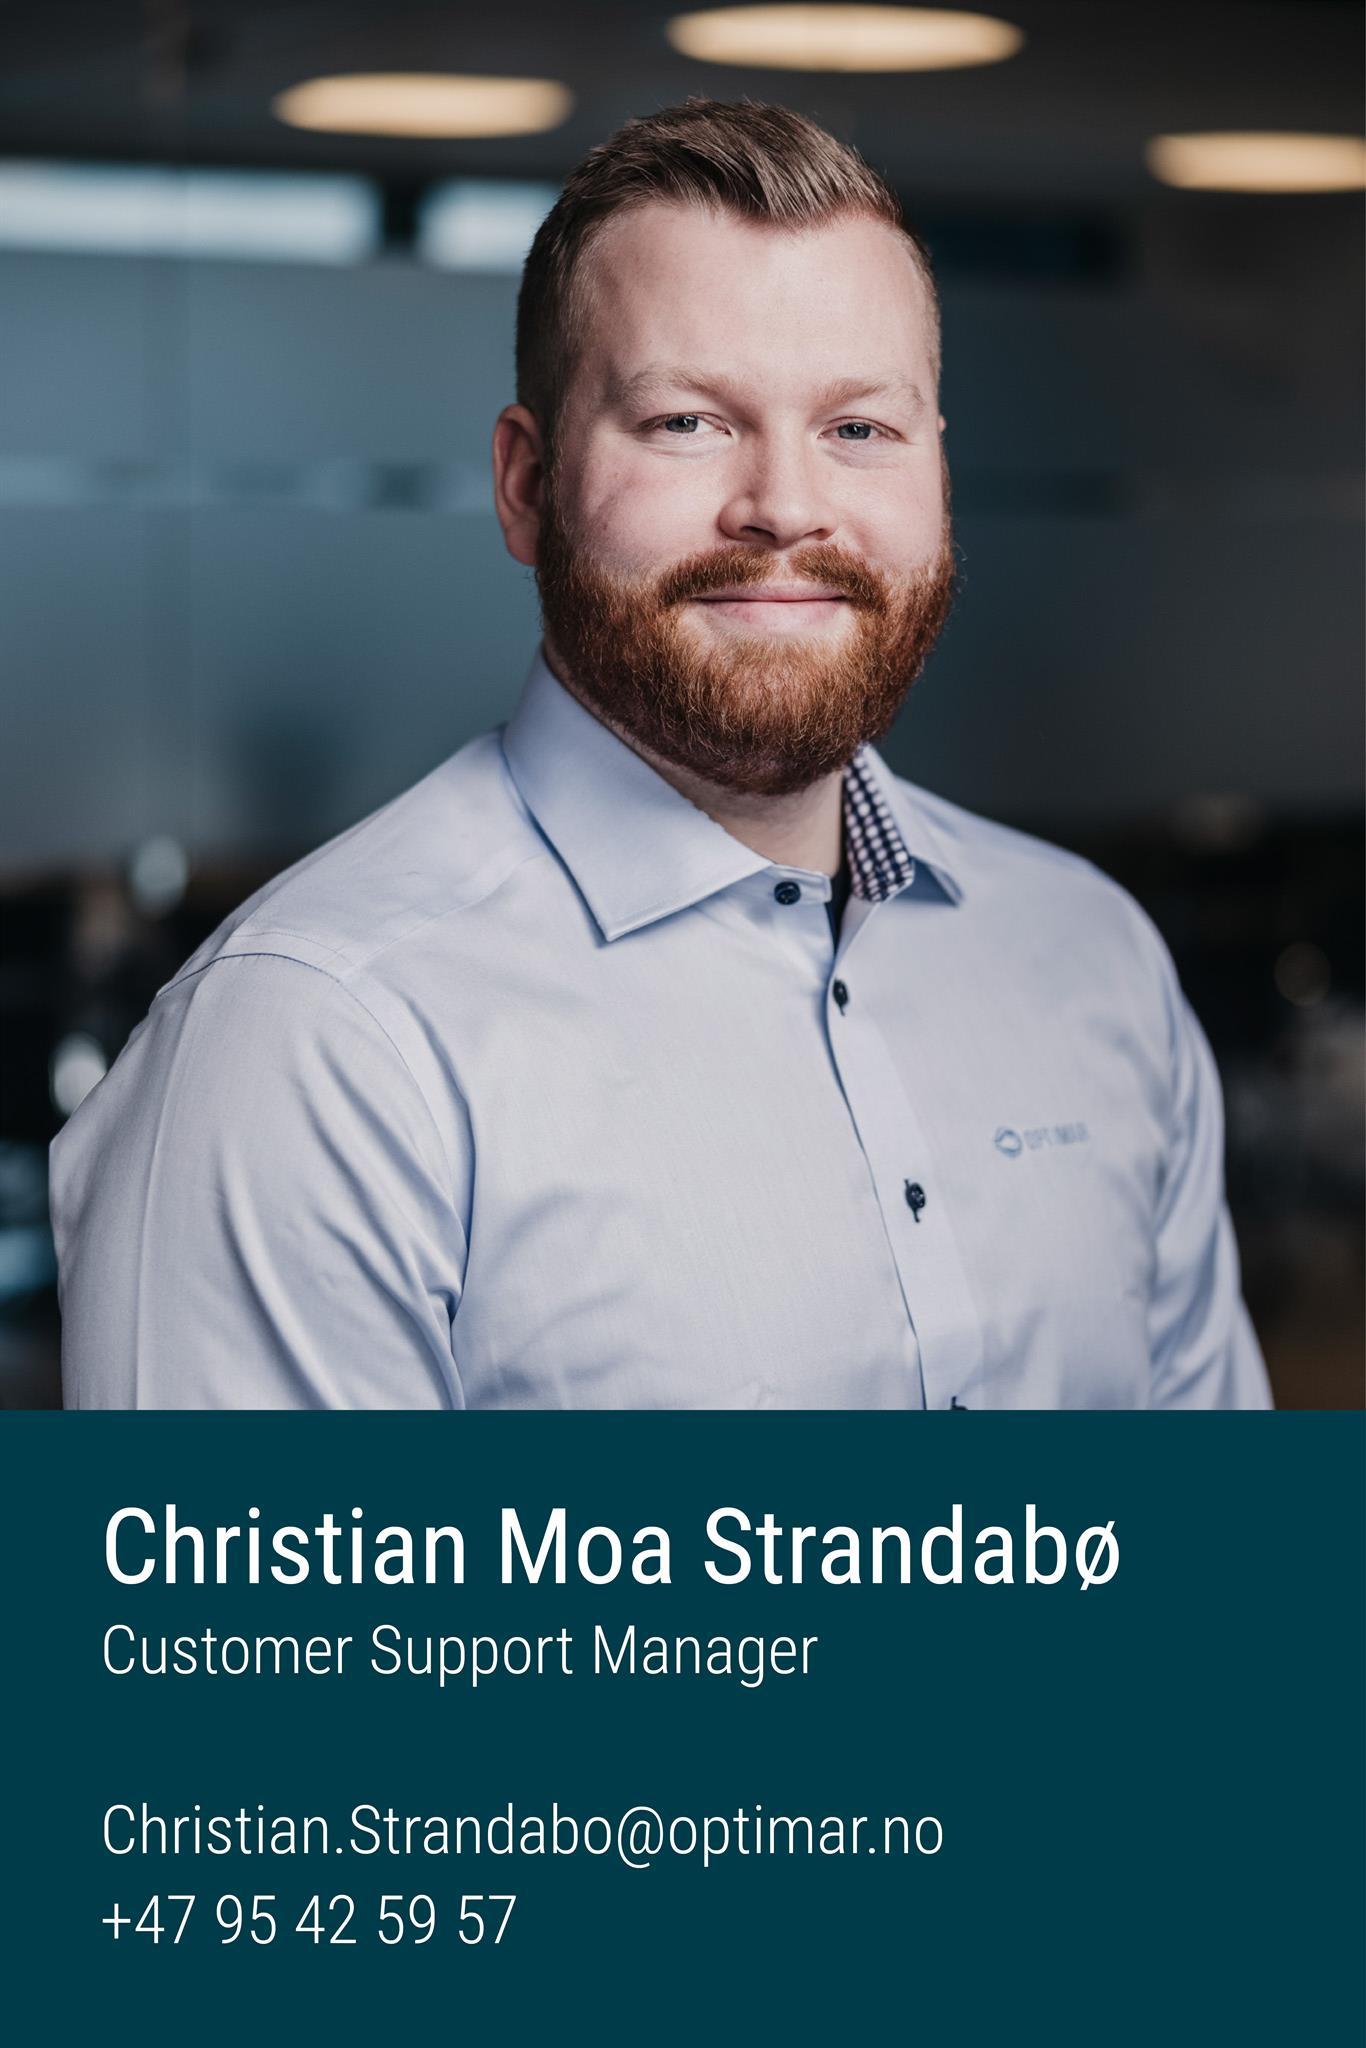 Christian Moa Strandabø